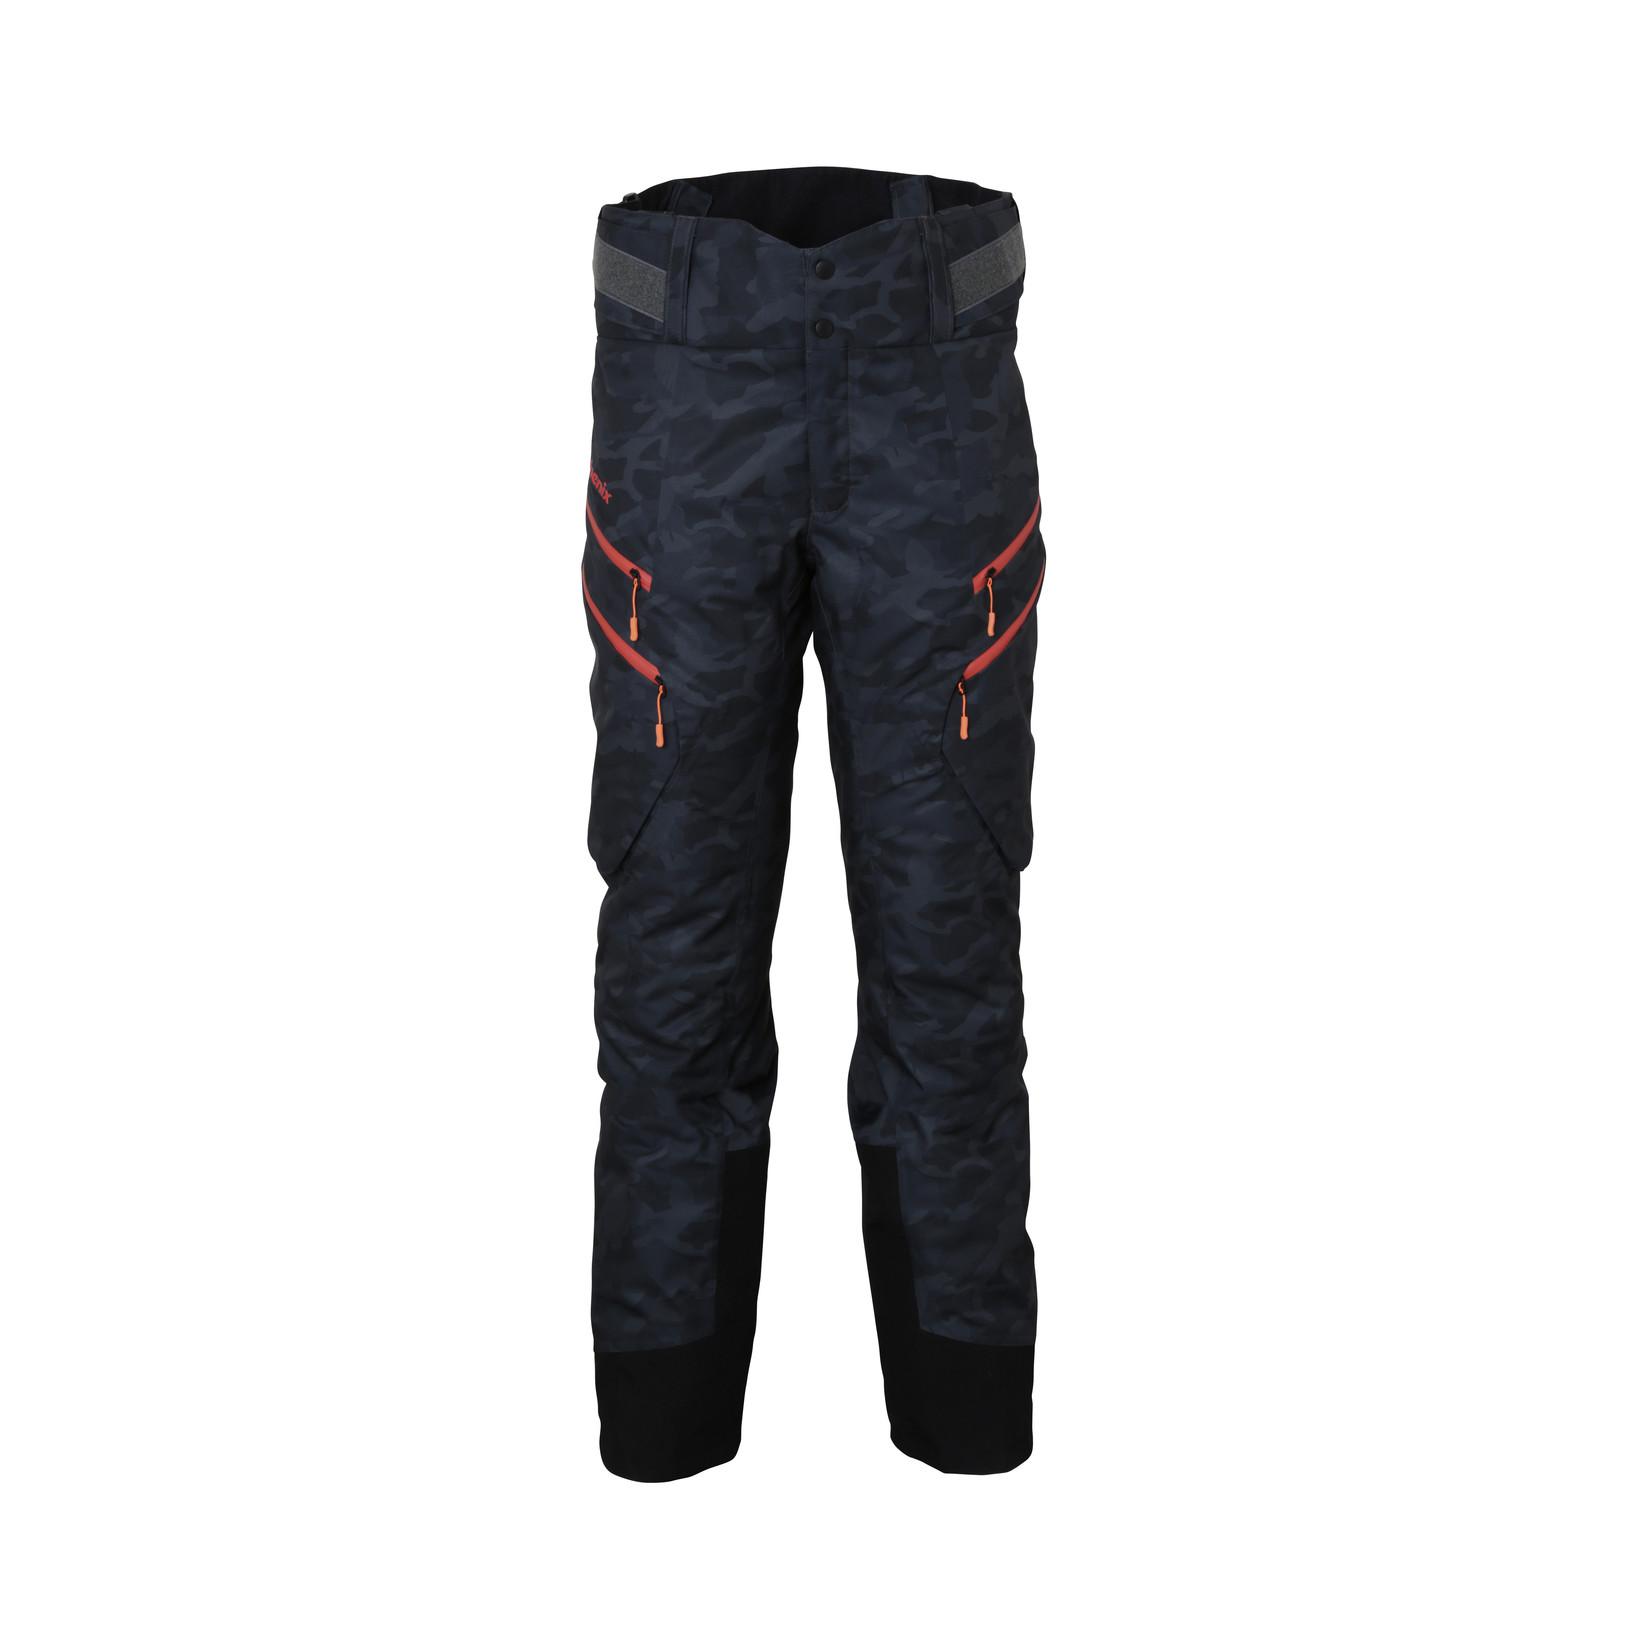 PHENIX Alpine Float Pants